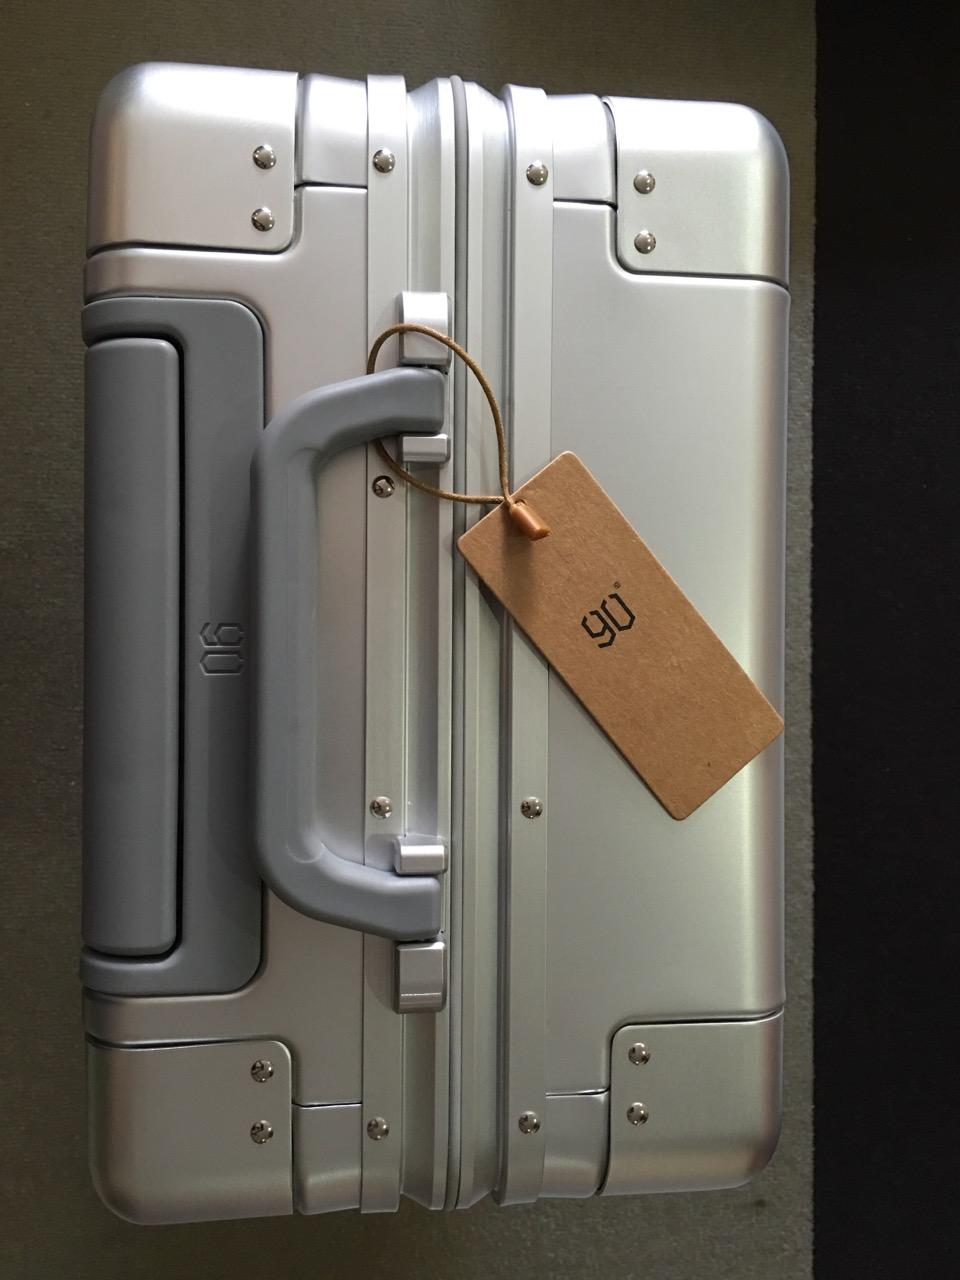 xiaomi-mi-90-smart-metal-luggage-suitcase-top-view